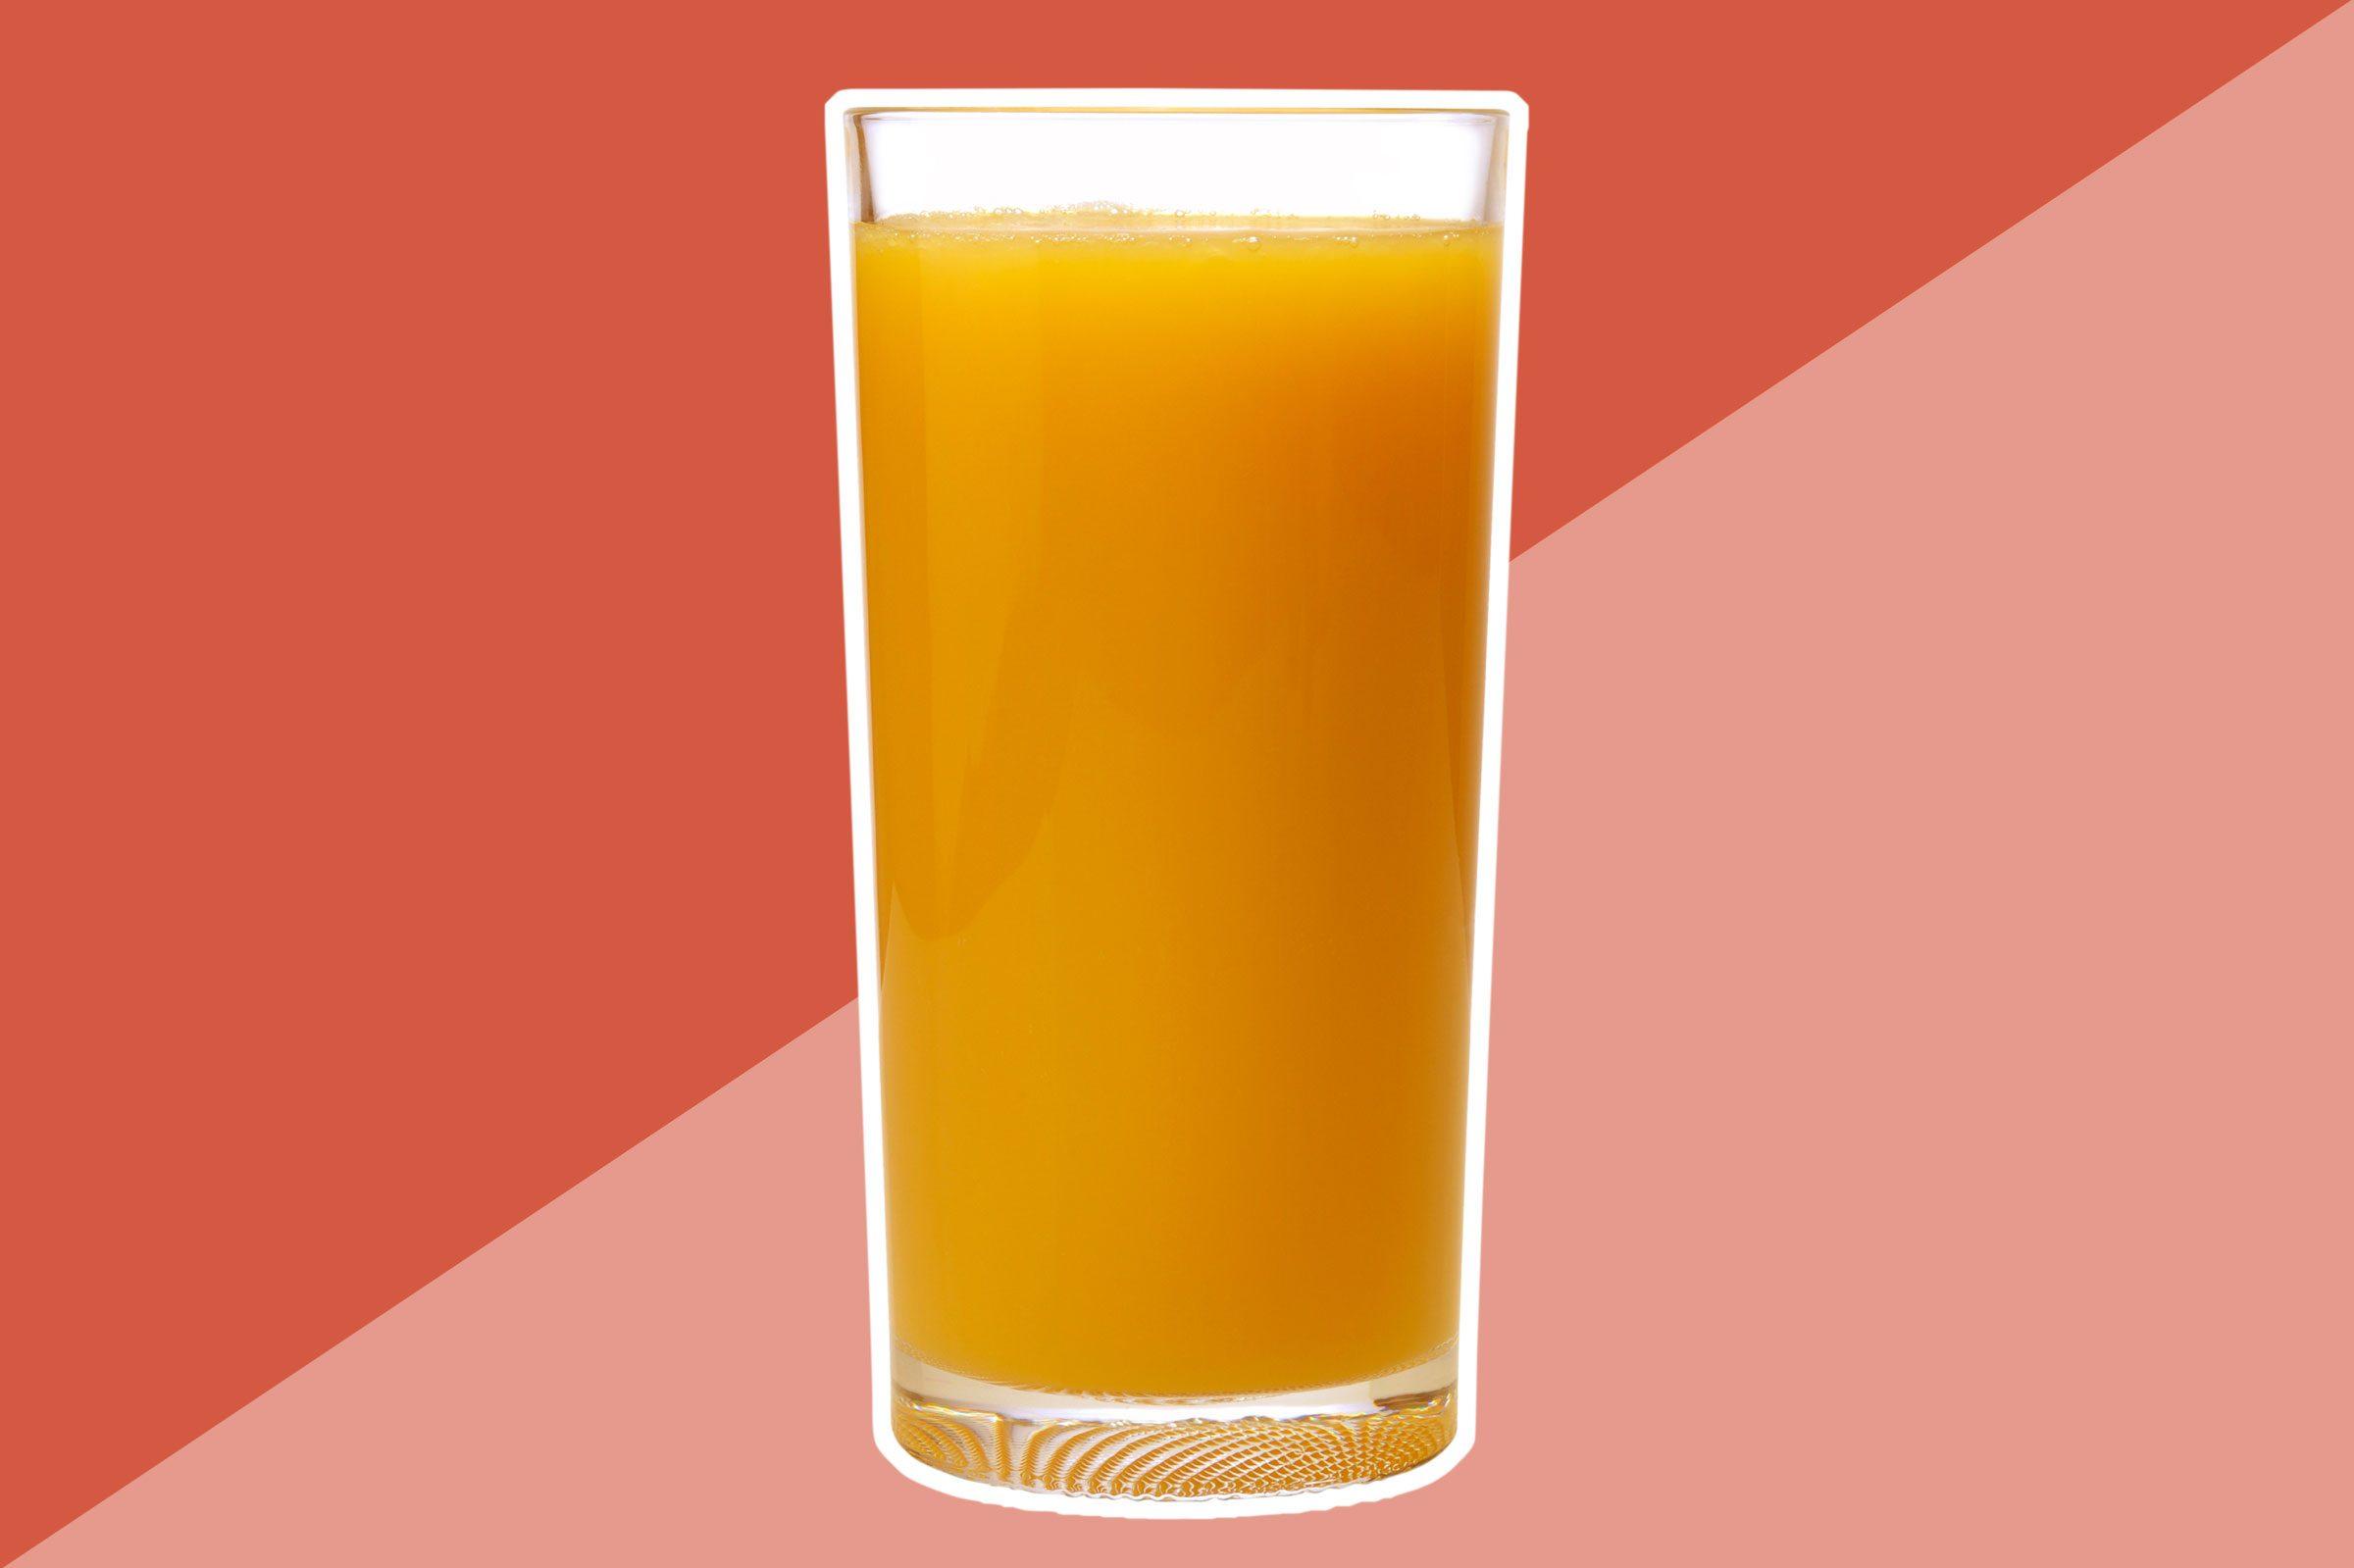 Can I Add Orange Juice To Cake Mix